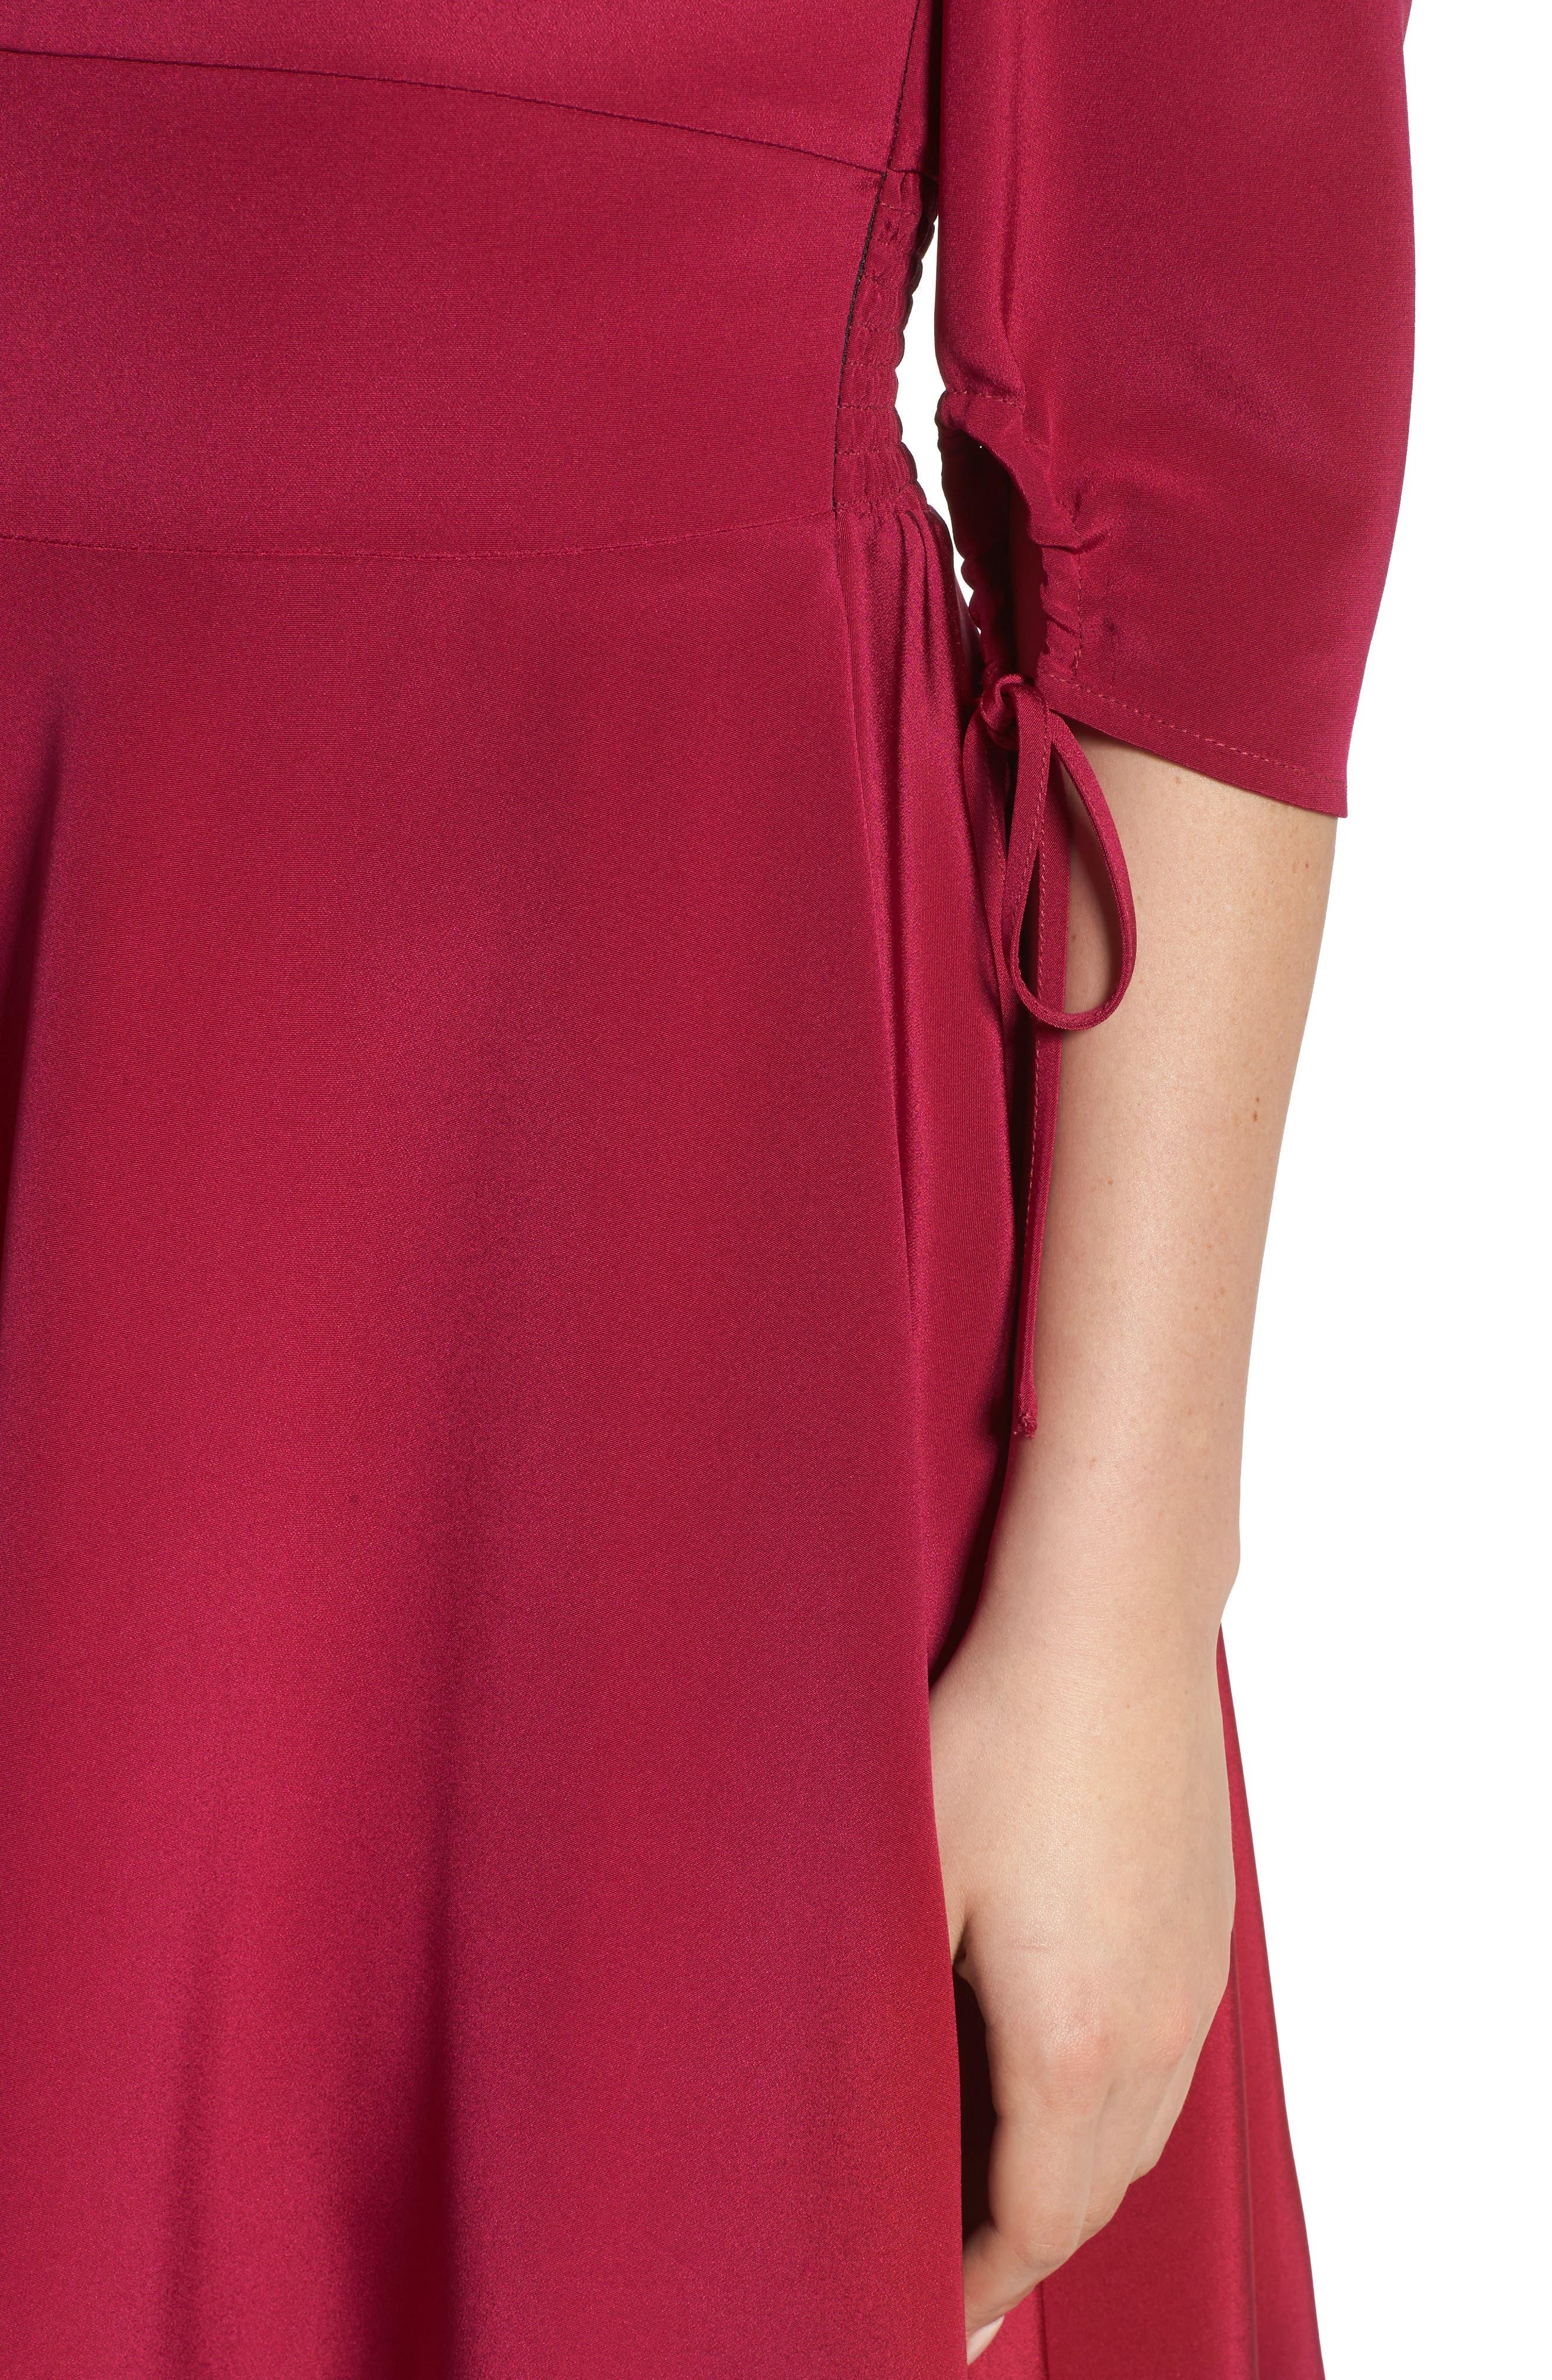 Cold Shoulder A-Line Dress,                             Alternate thumbnail 4, color,                             654